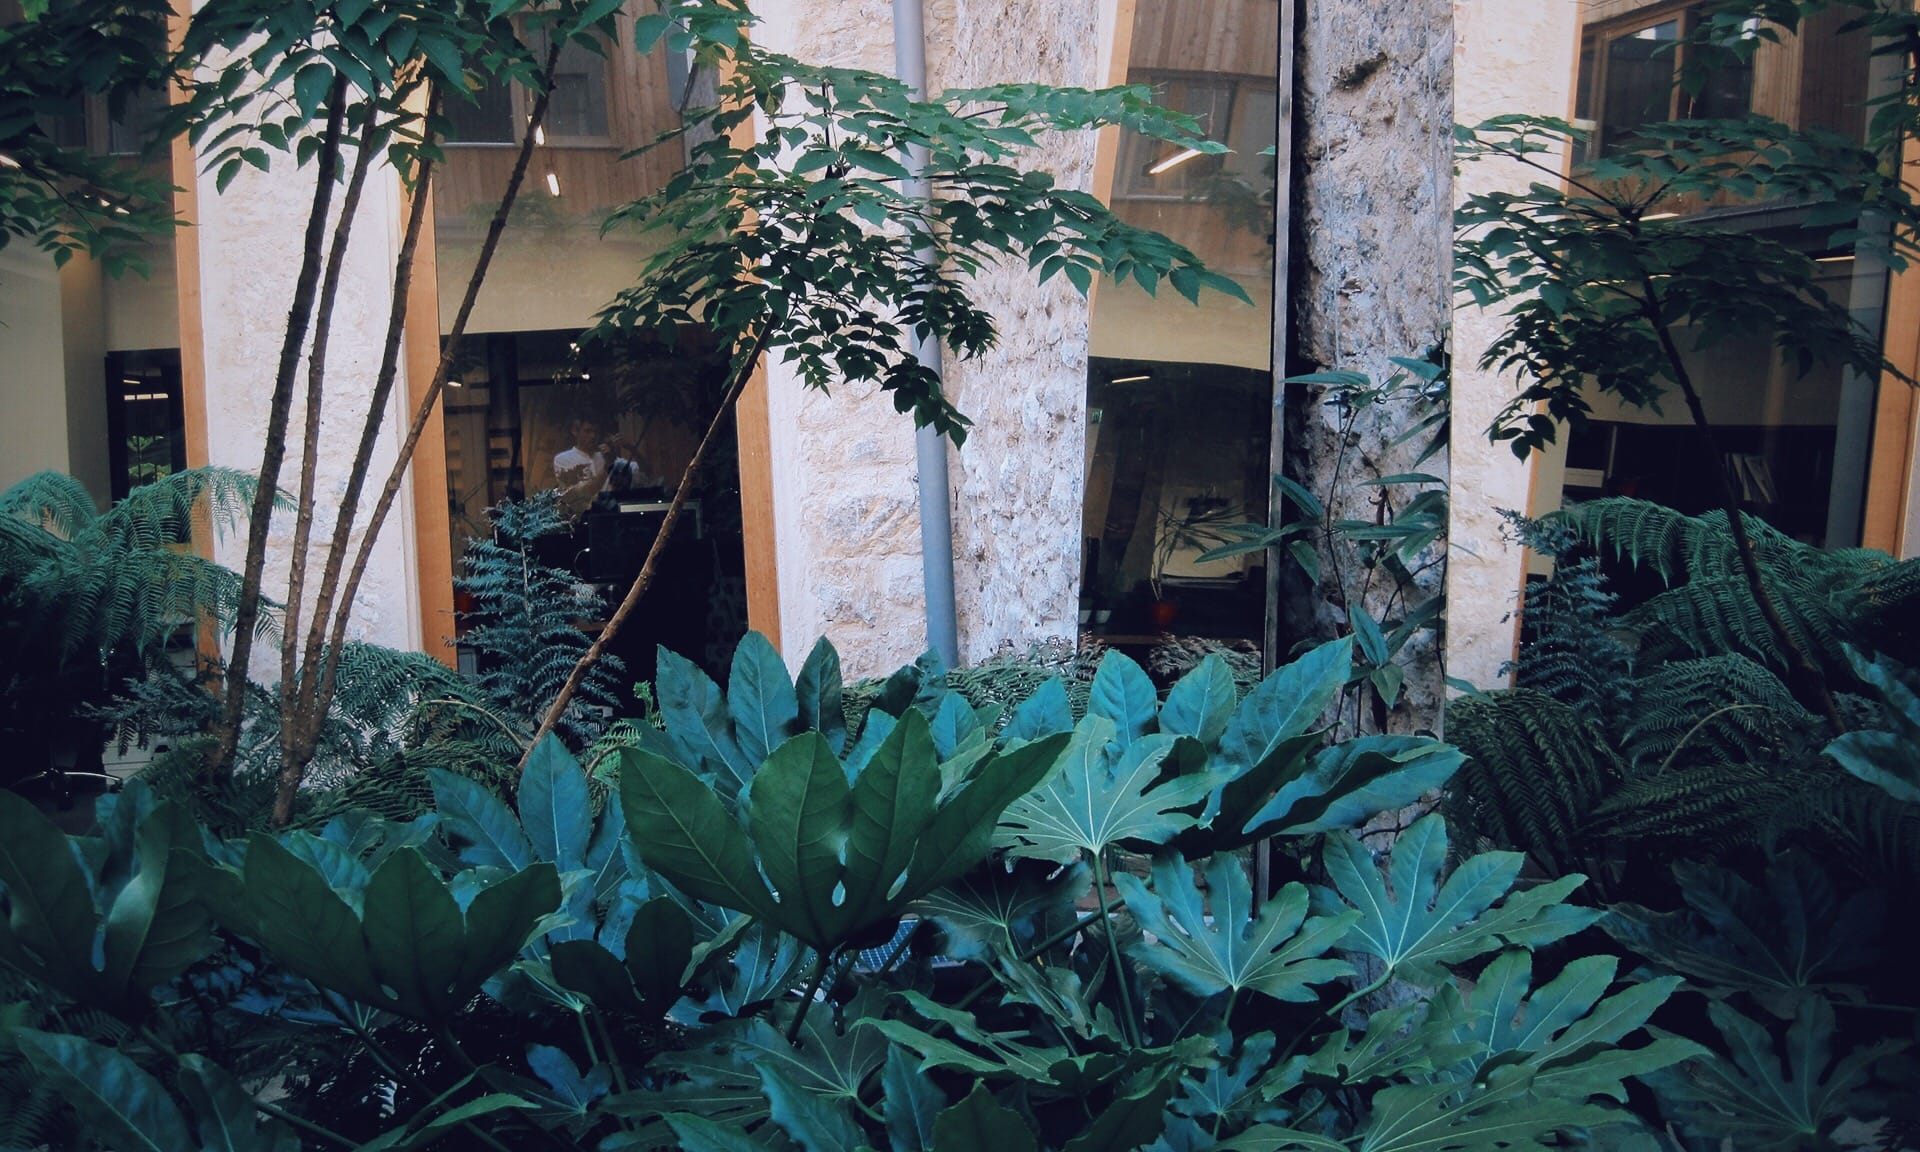 02_Nordscape_patio-jardin-miroirs